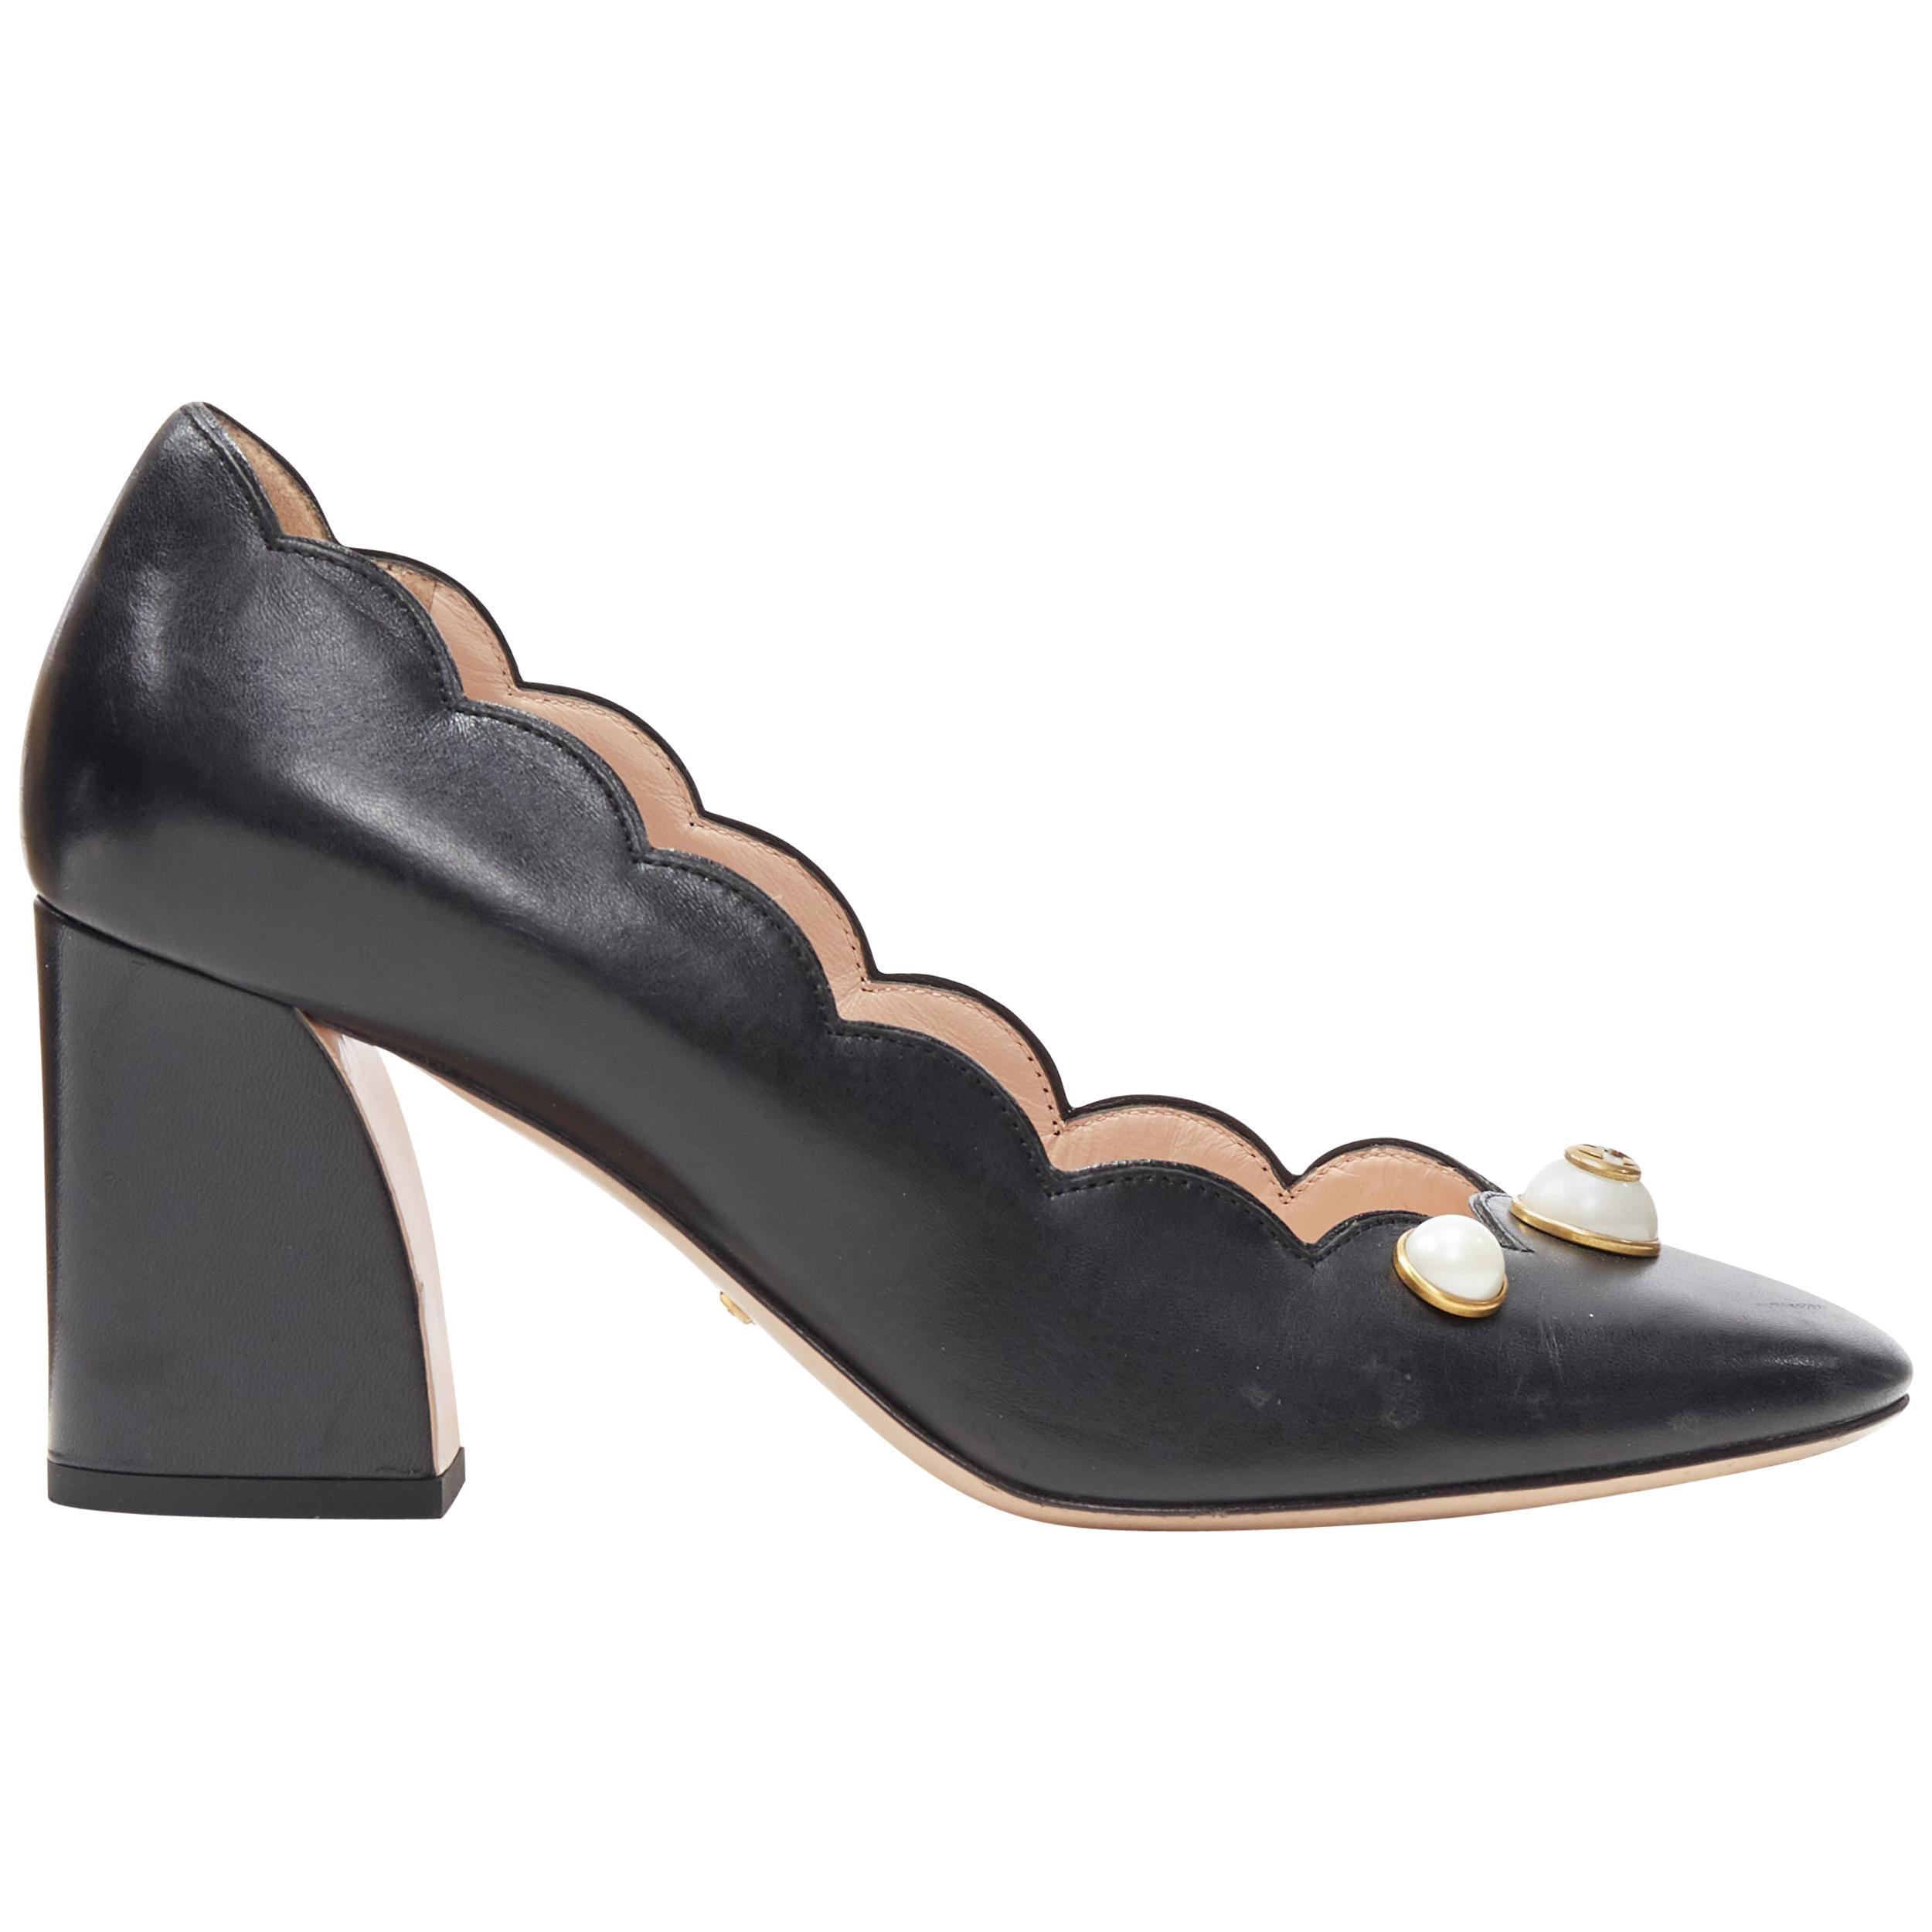 GUCCI GG Pearl black leather scalloped edge round toe chunky heel pump EU37.5